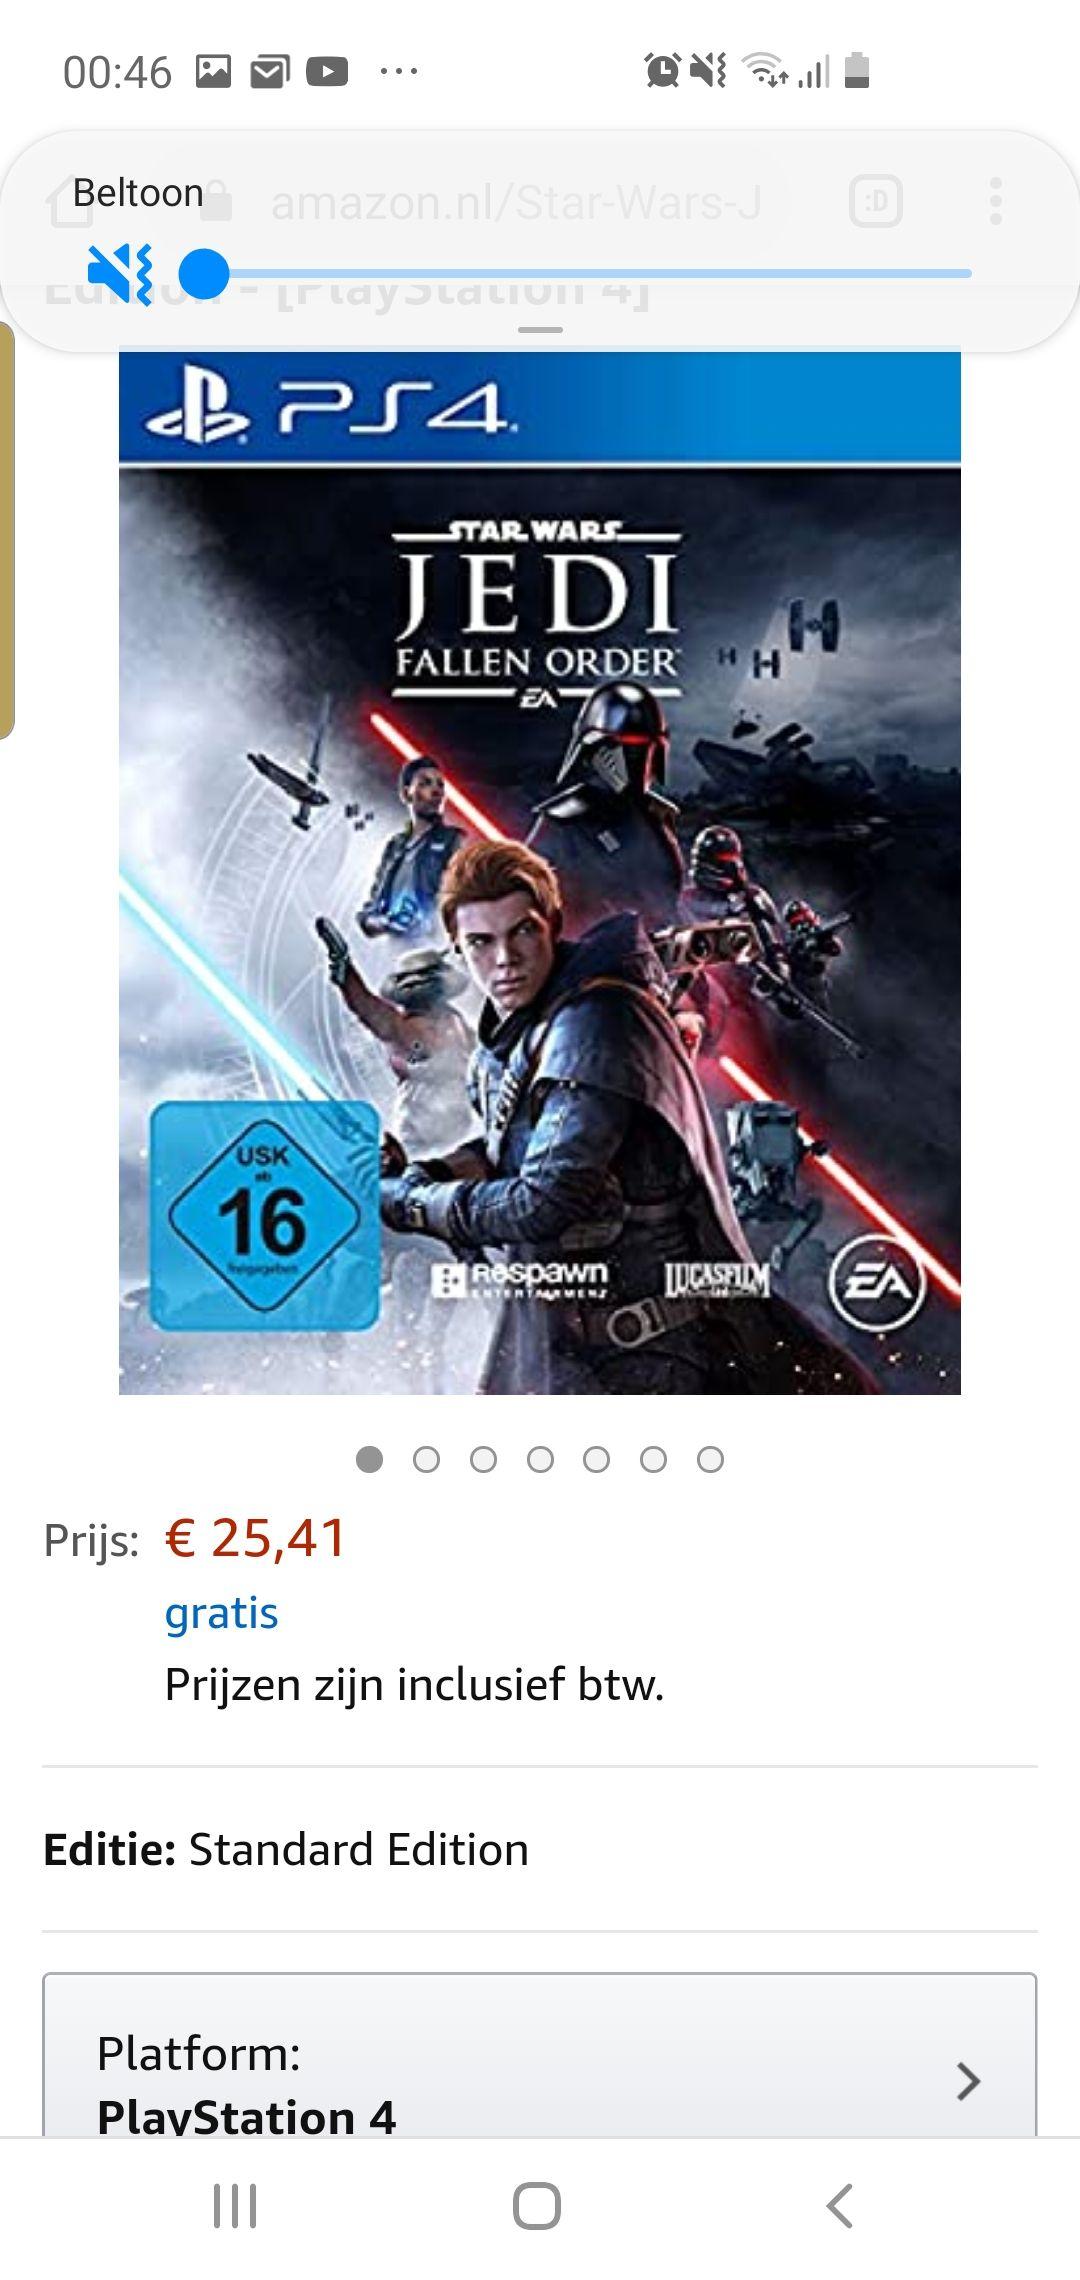 Star Wars Jedi: Fallen Order PS4 @ Amazon.nl